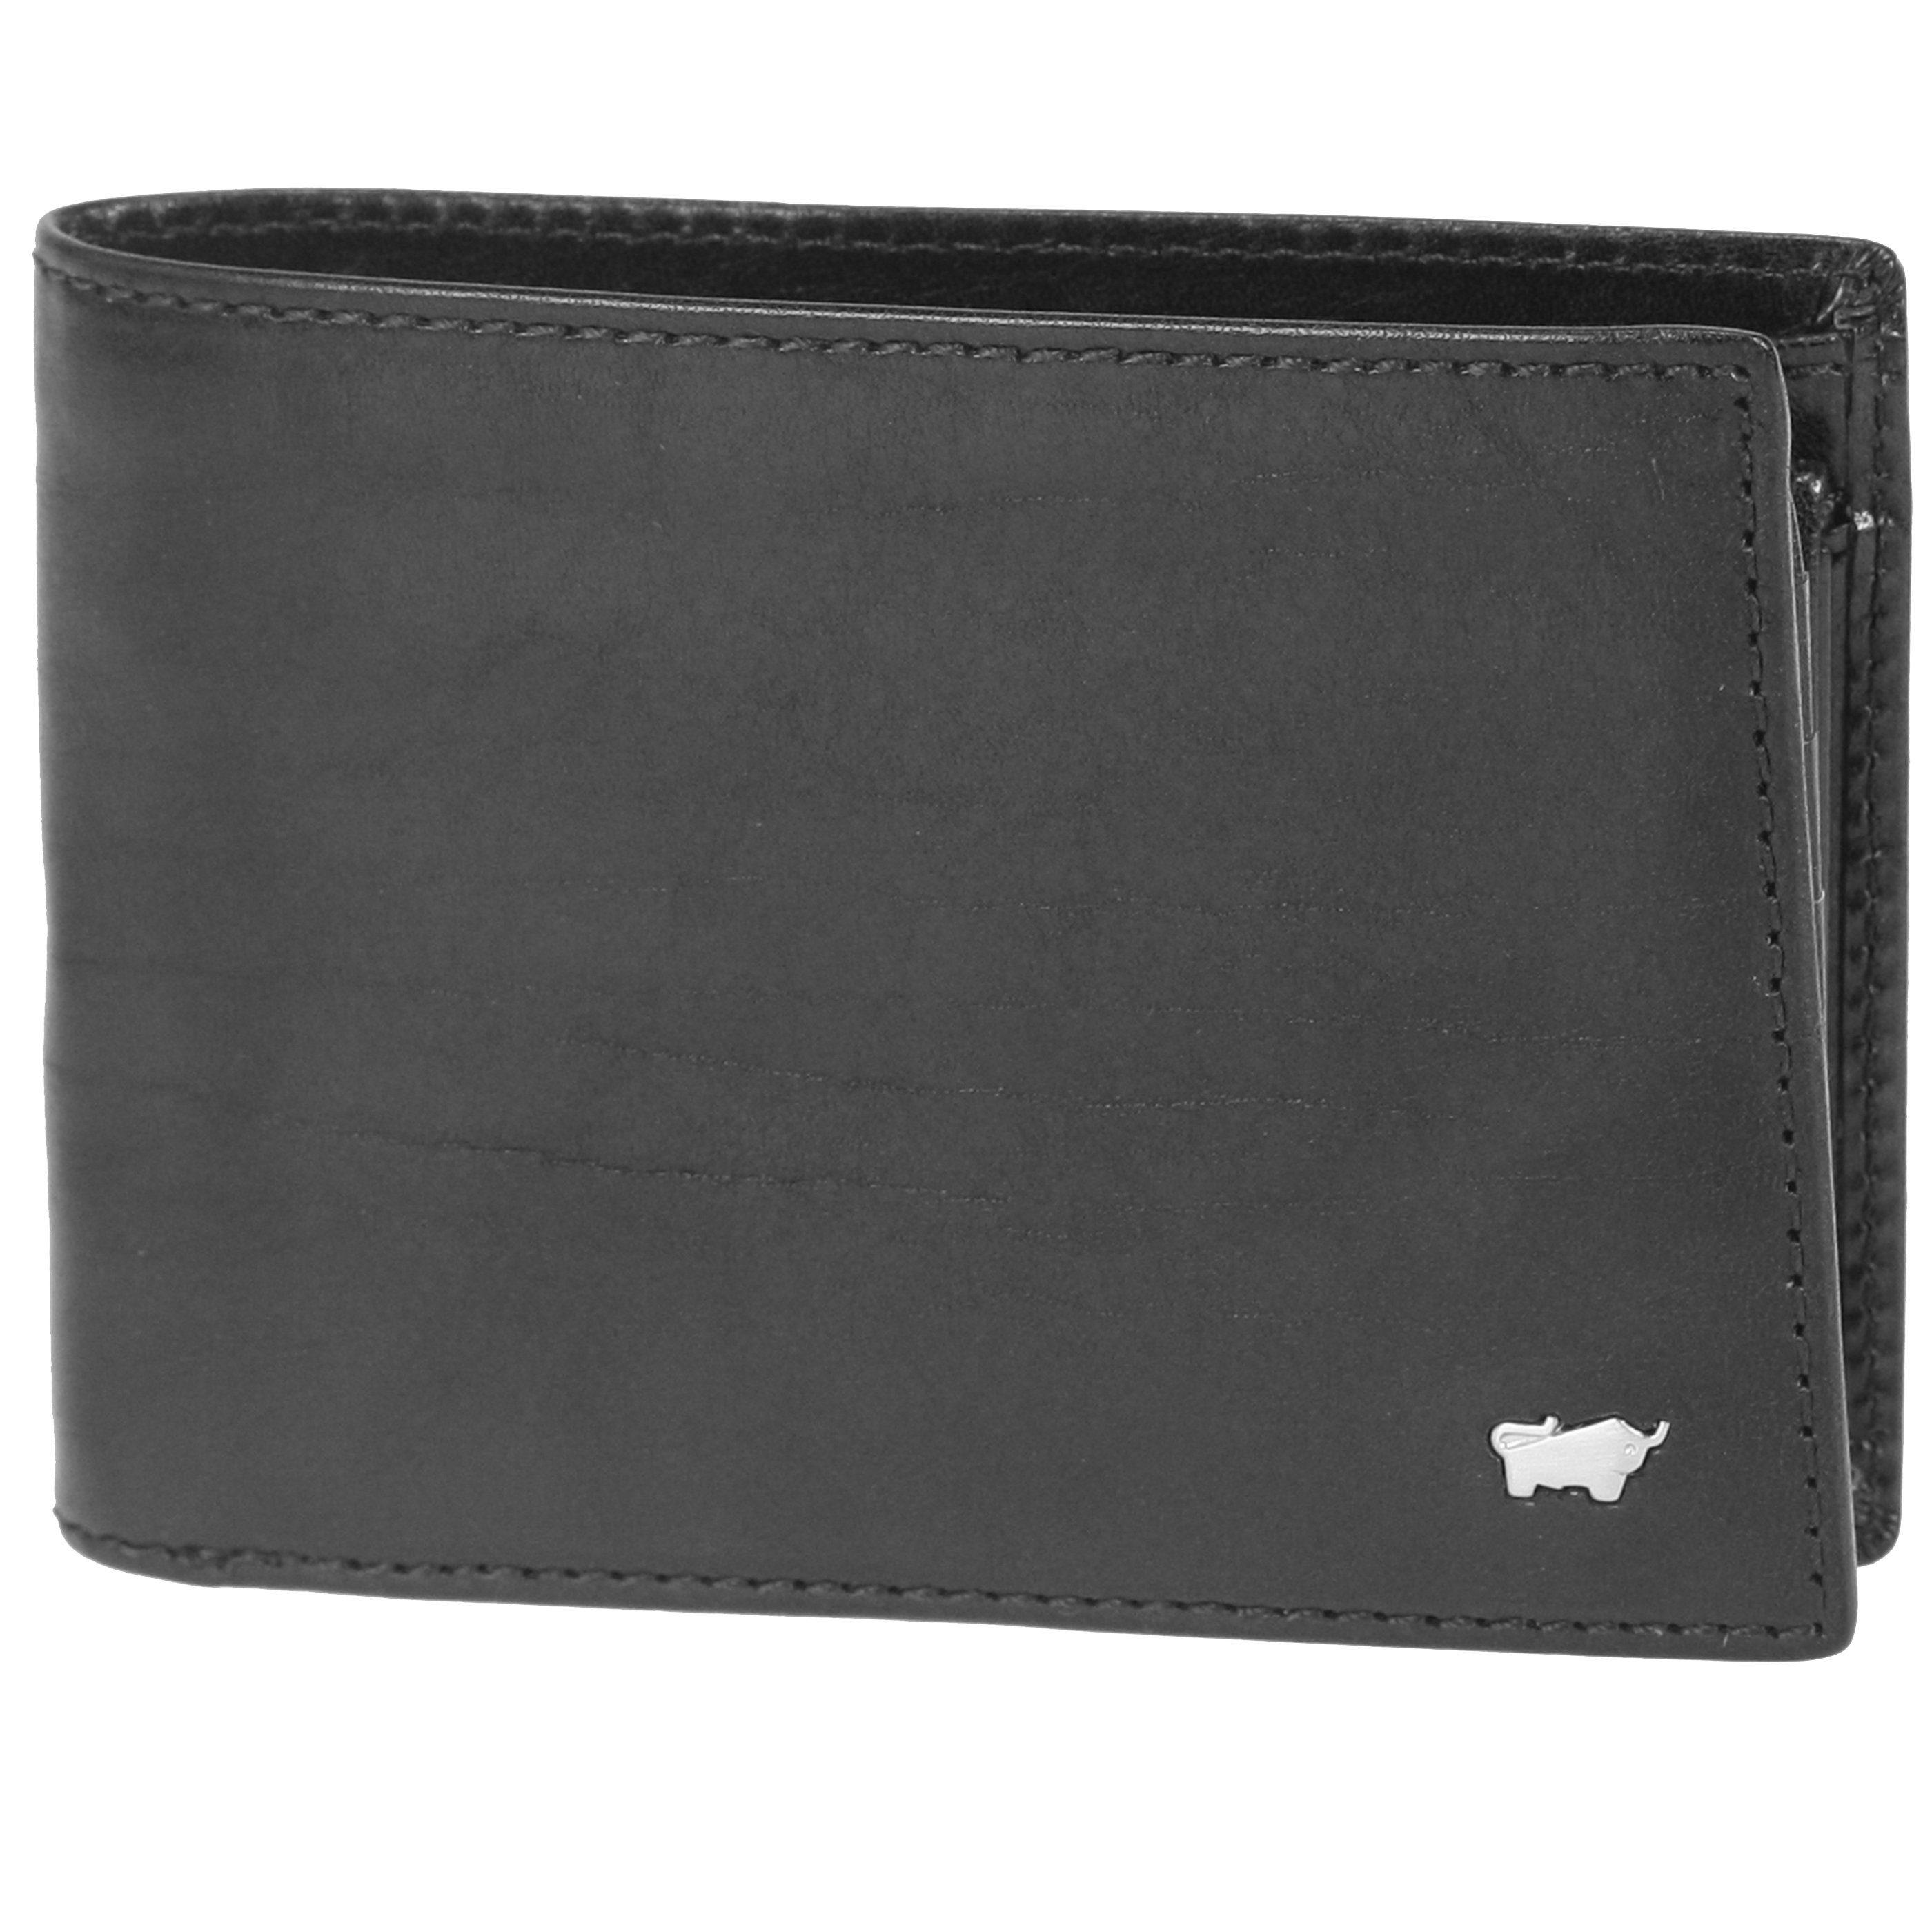 Braun Büffel Basic Geldbörse VI Leder 12,5 cm